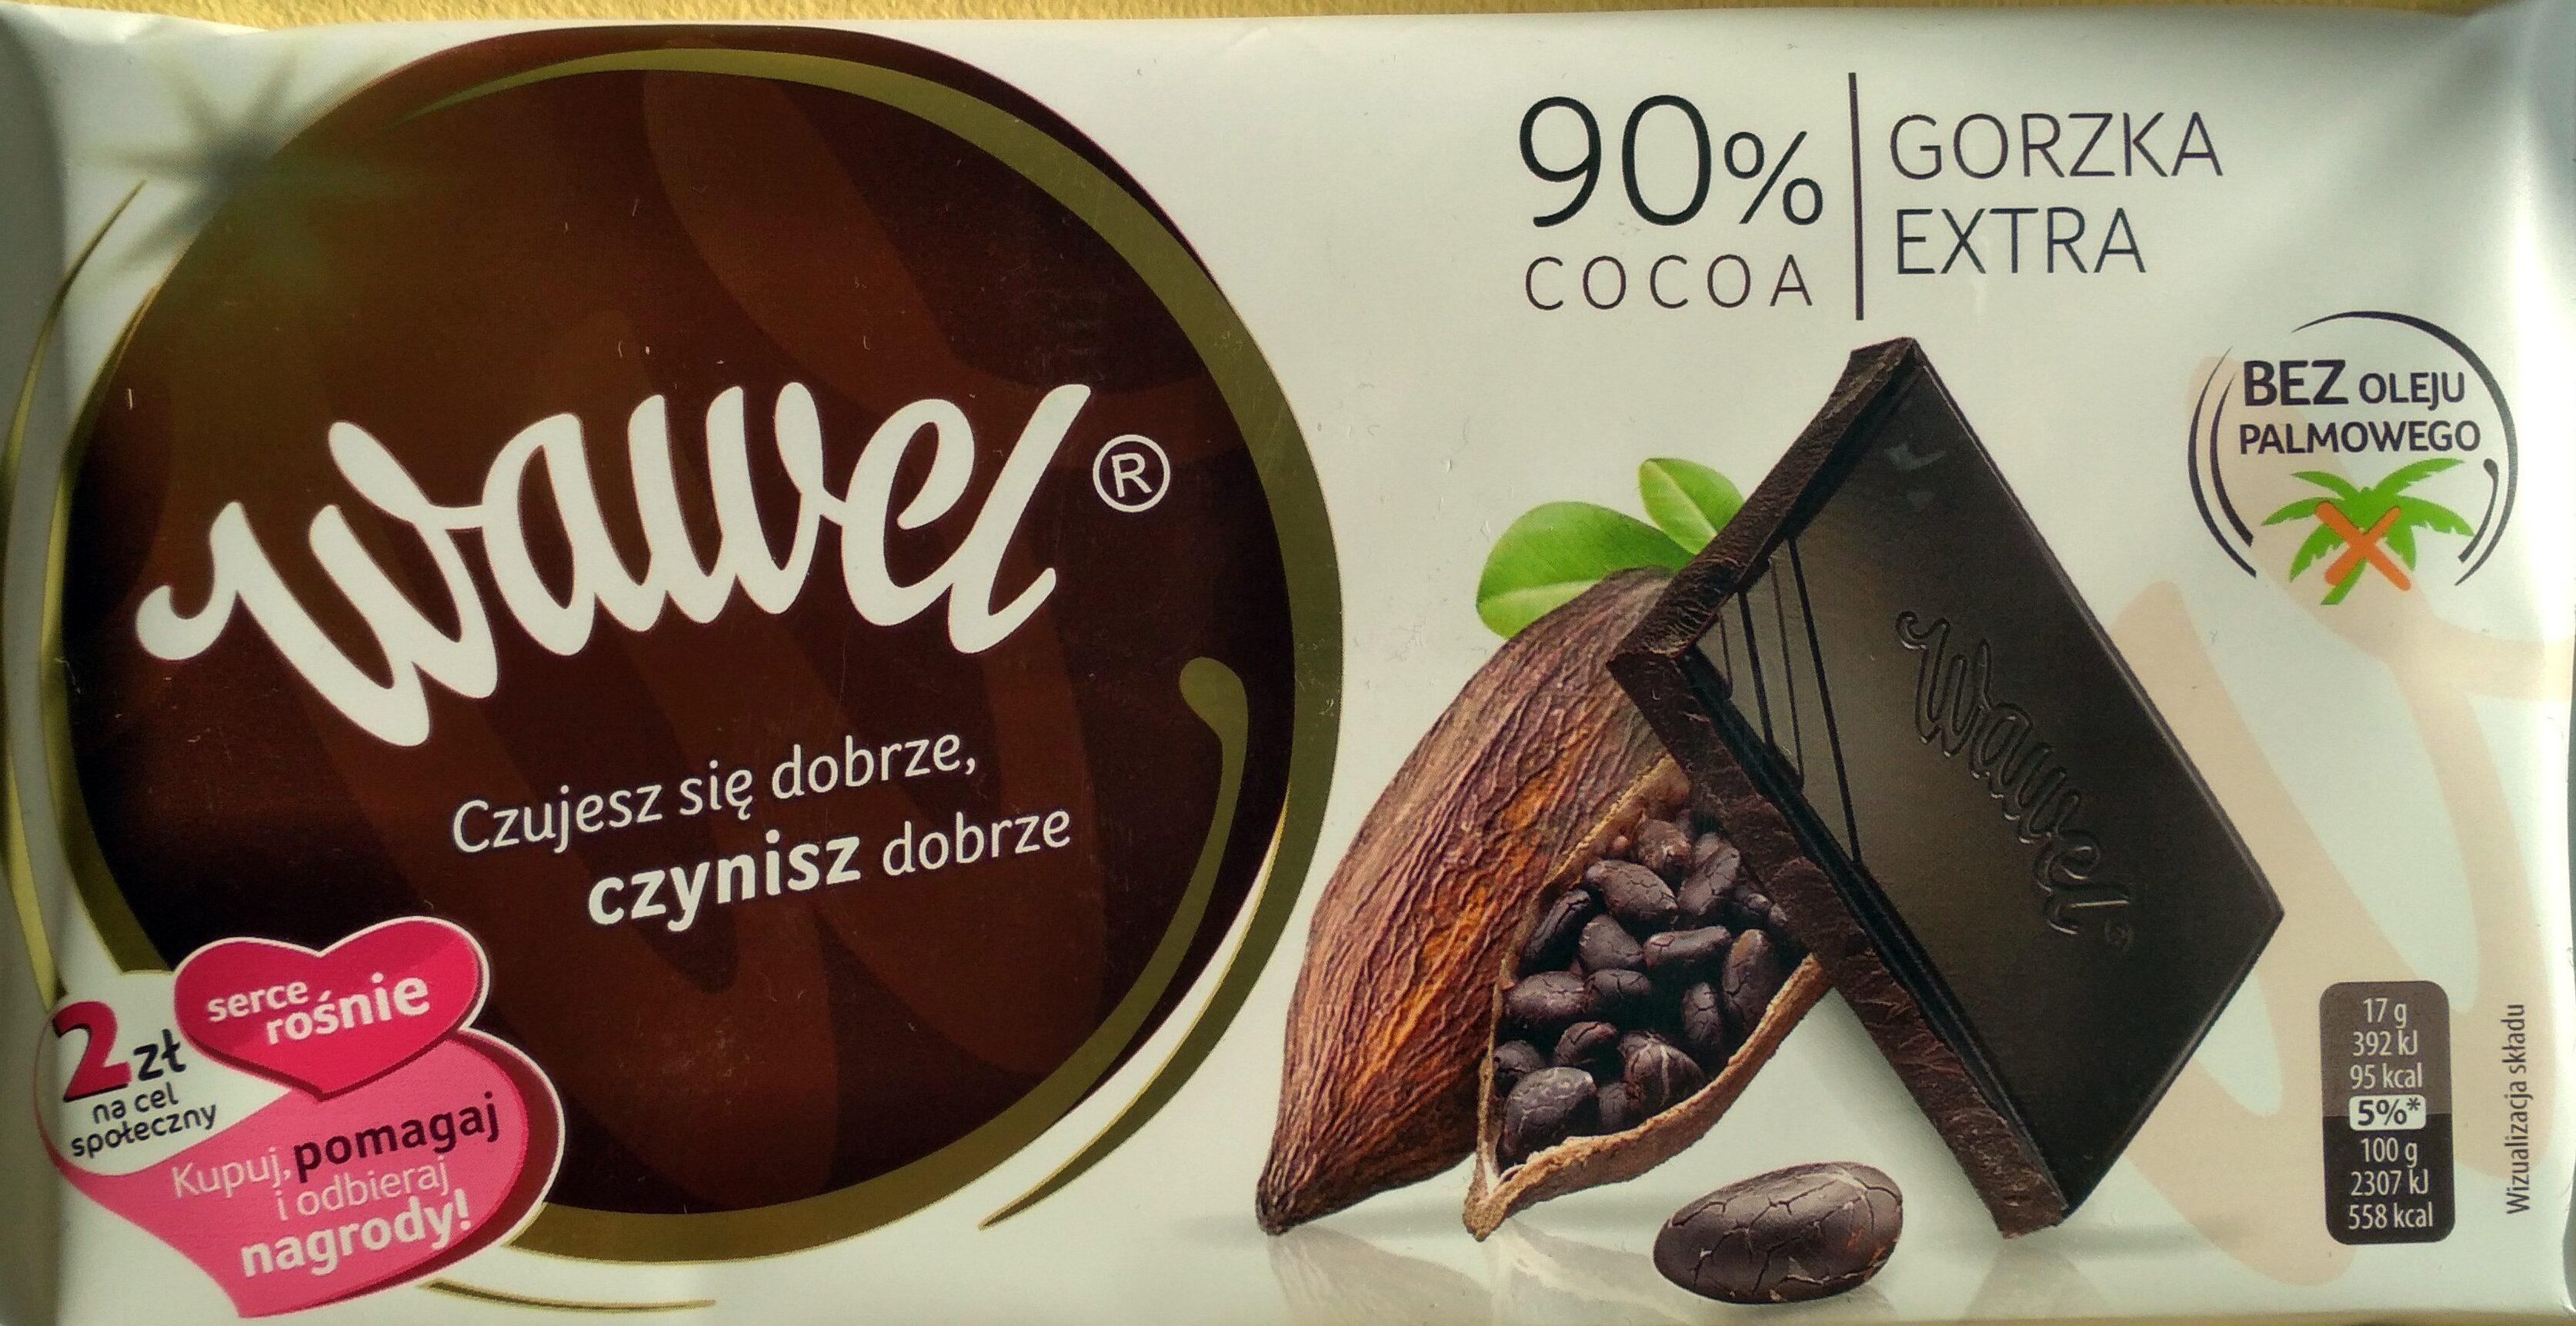 Czekolada Gorzka Extra , Cocoa 90% - Produkt